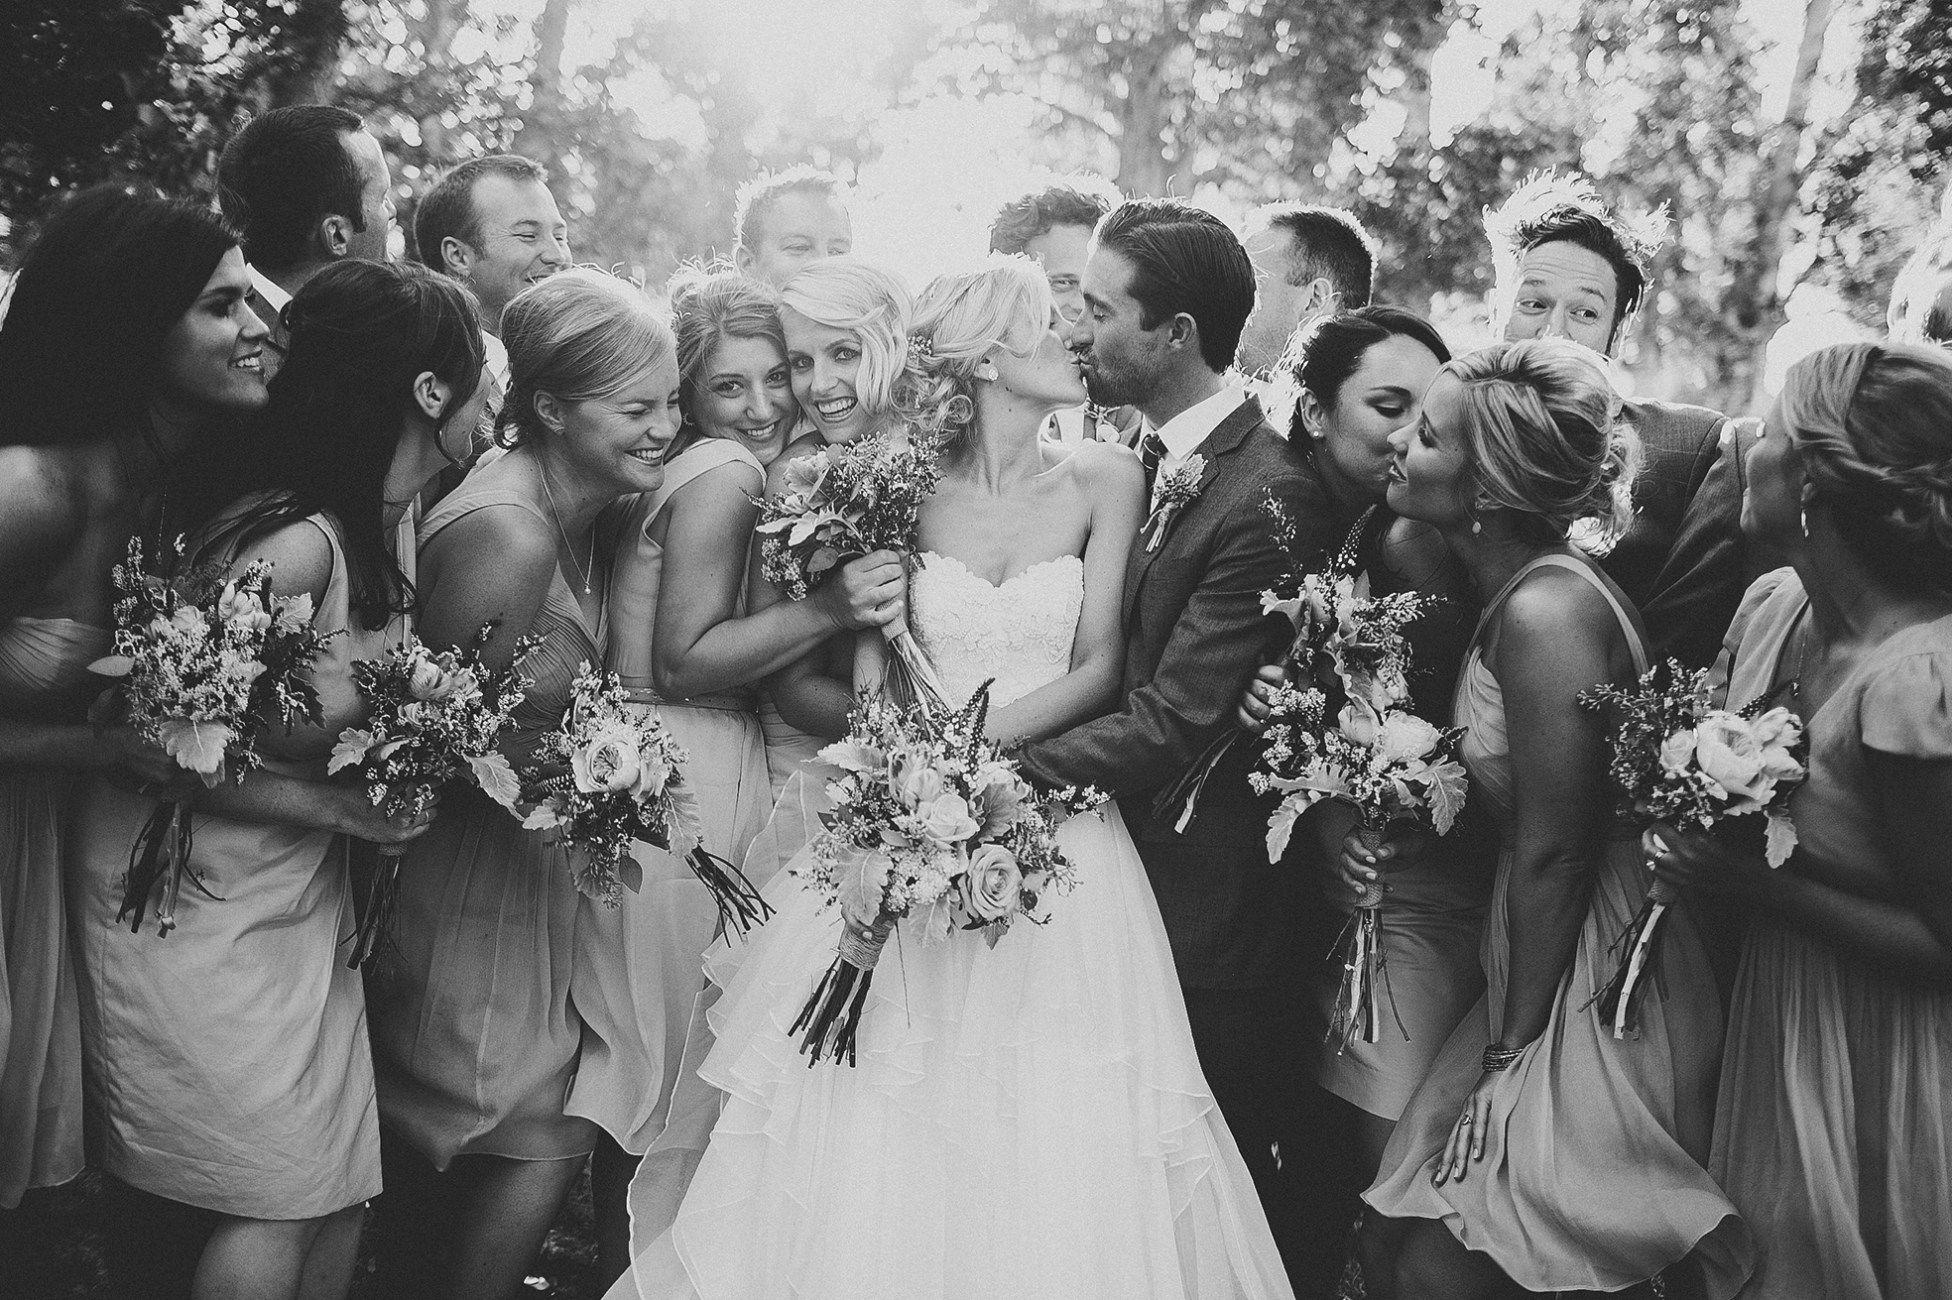 WEDDING PHOTOGRAPHER | wild whim design + photography | Los Angeles + Santa Barbara